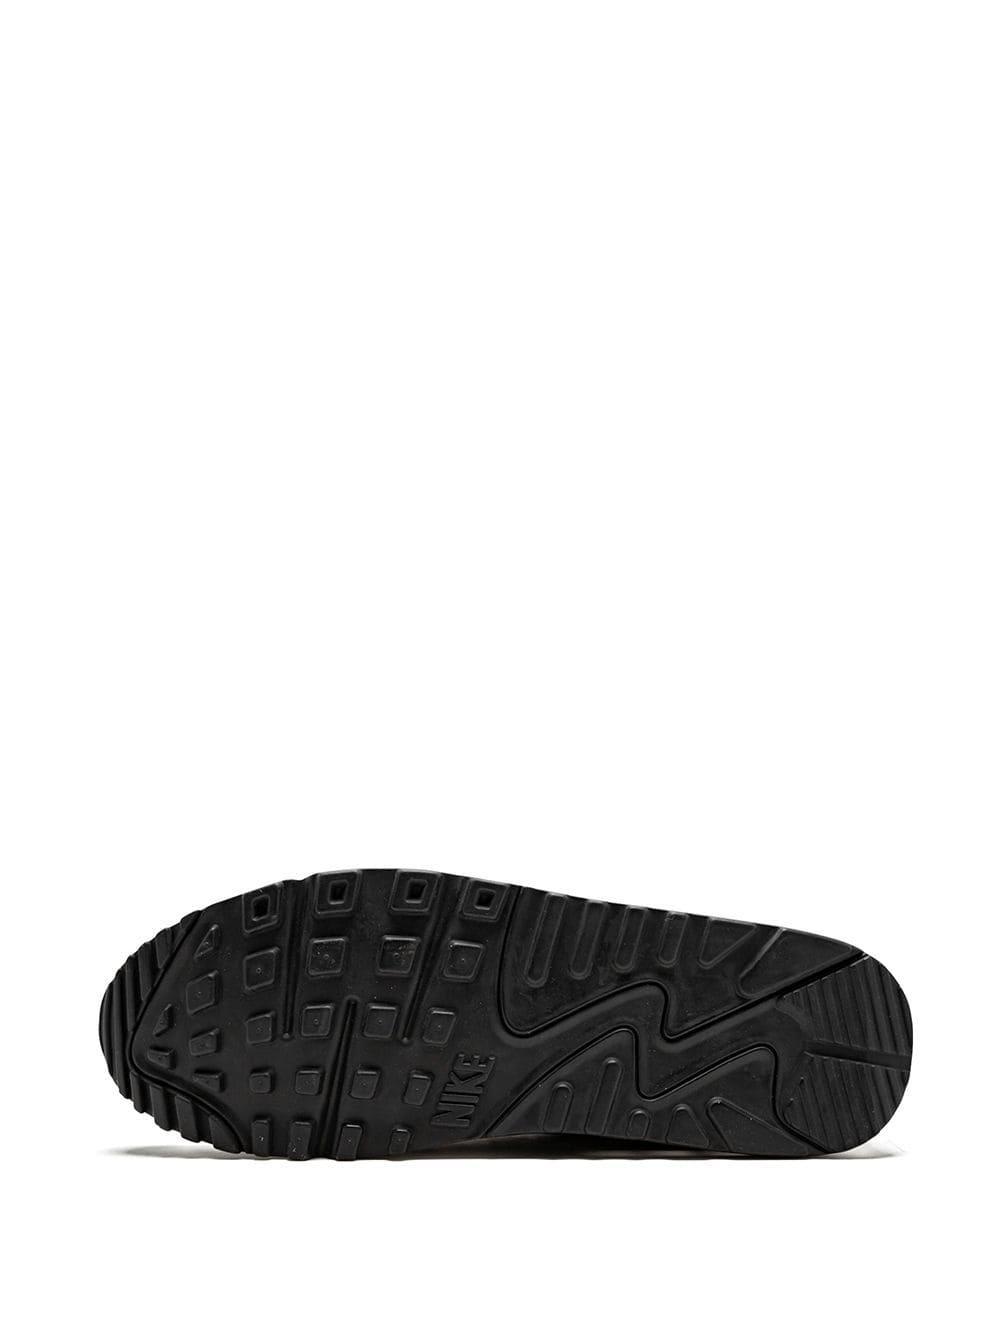 Nike Leather Air Max 90 Premium 'atmos in Black for Men - Lyst